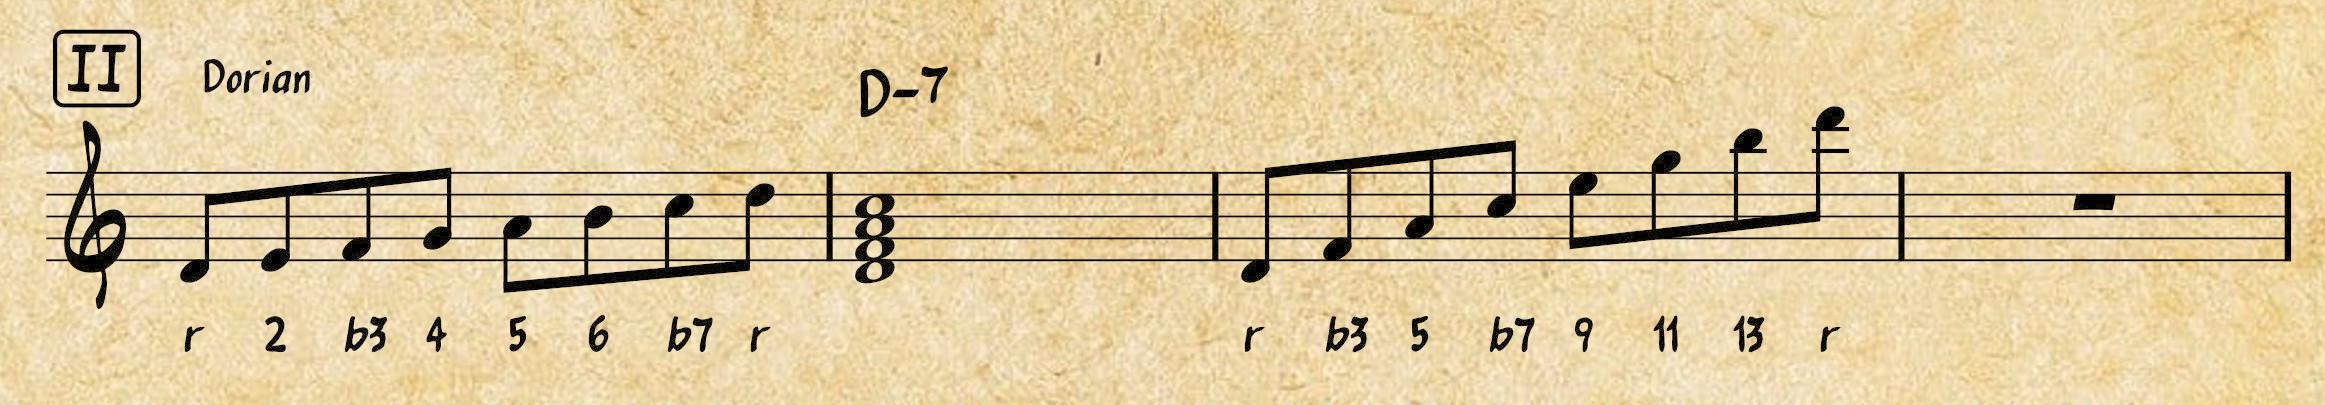 Western Music Theory: Dorian